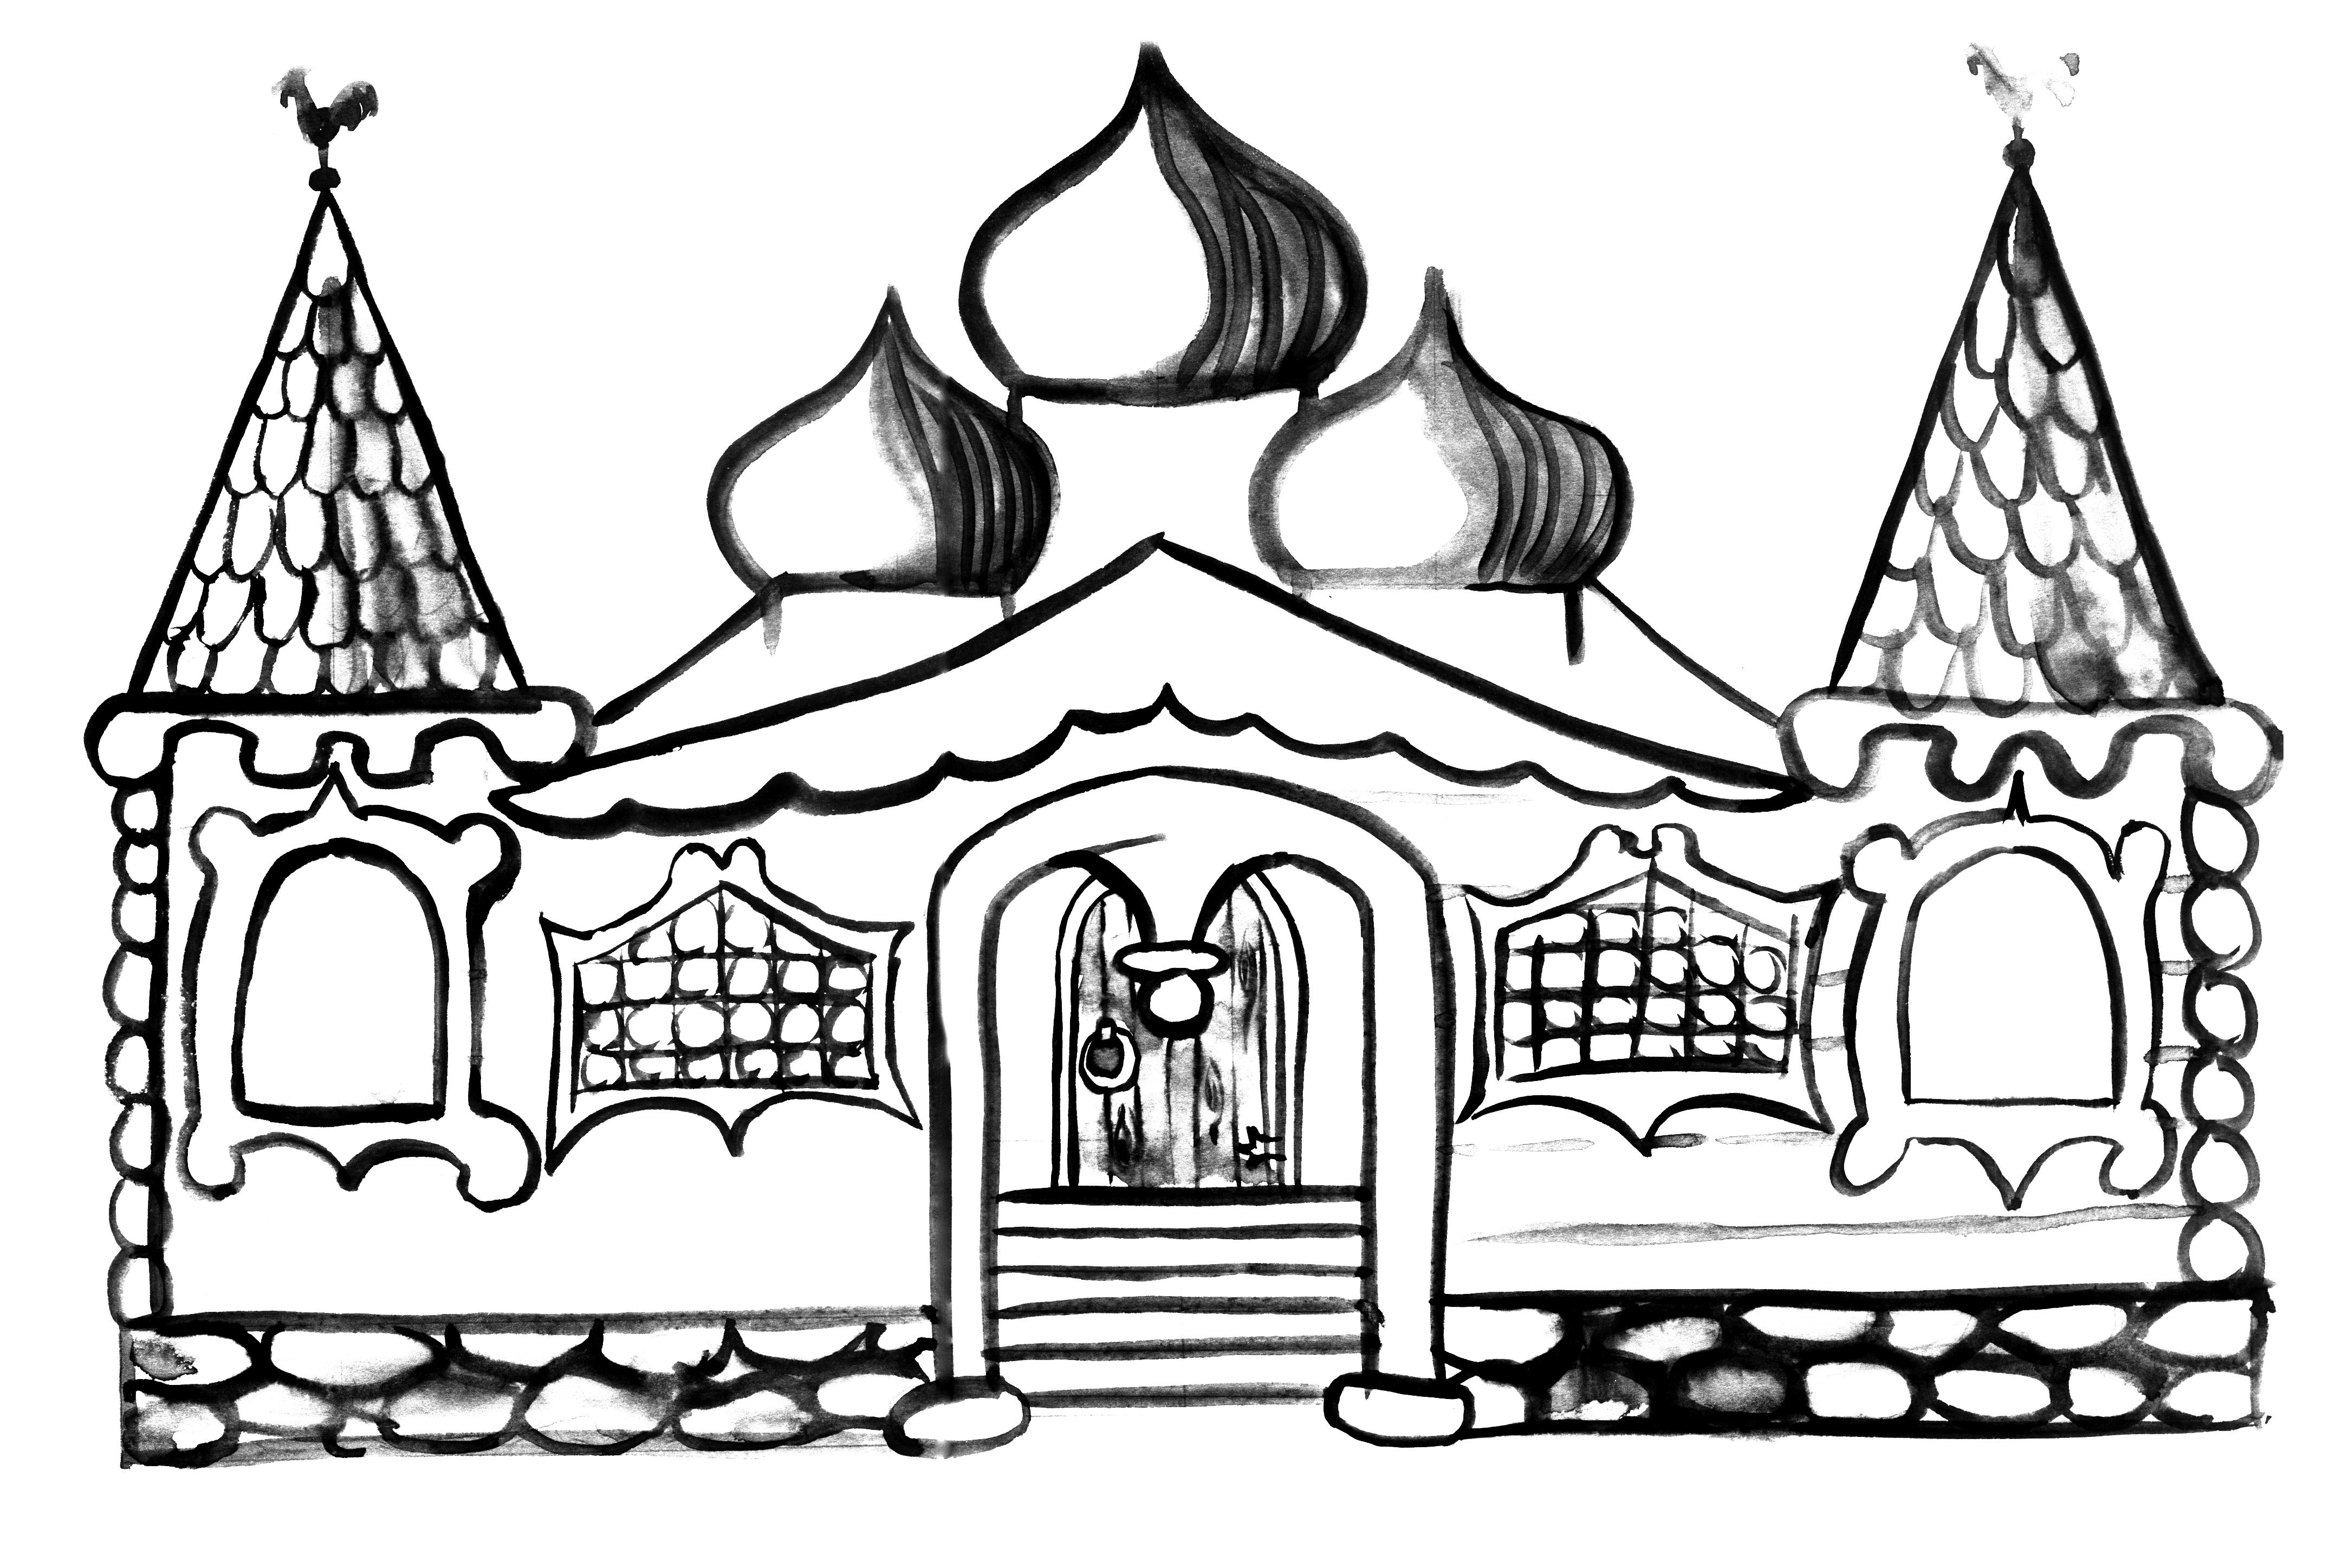 Картинки теремов нарисованных